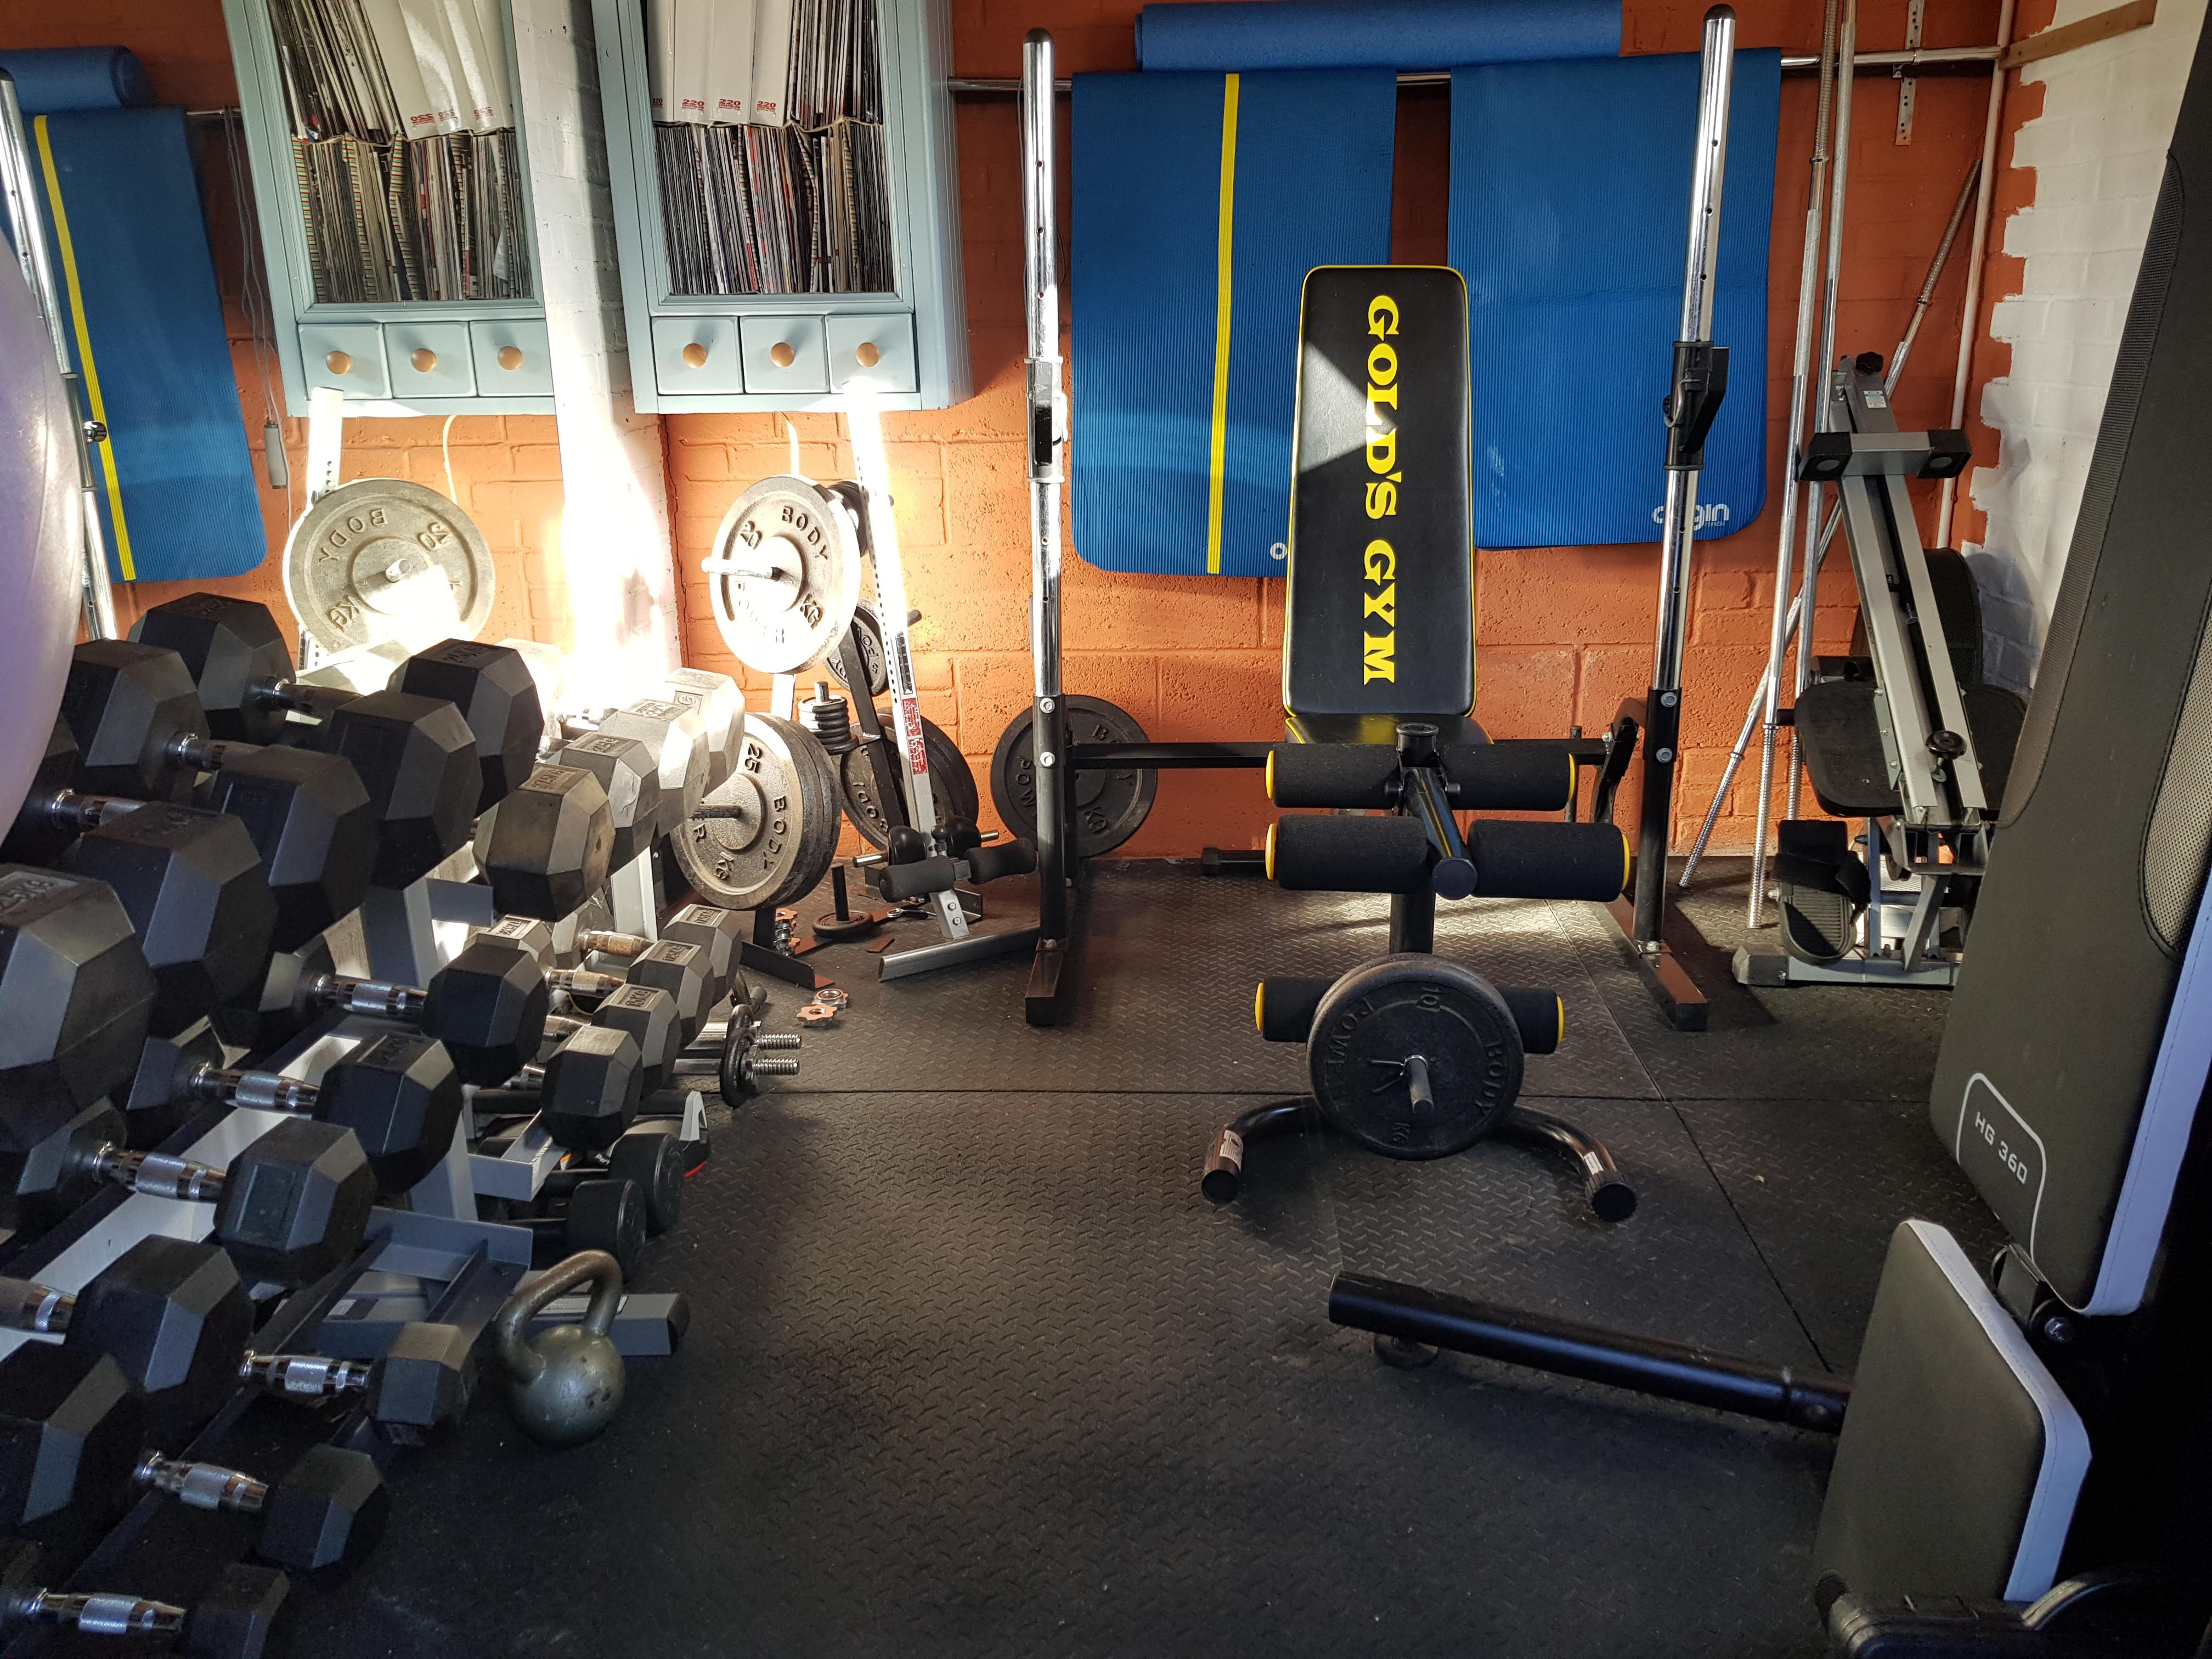 Coach House Gym Hire